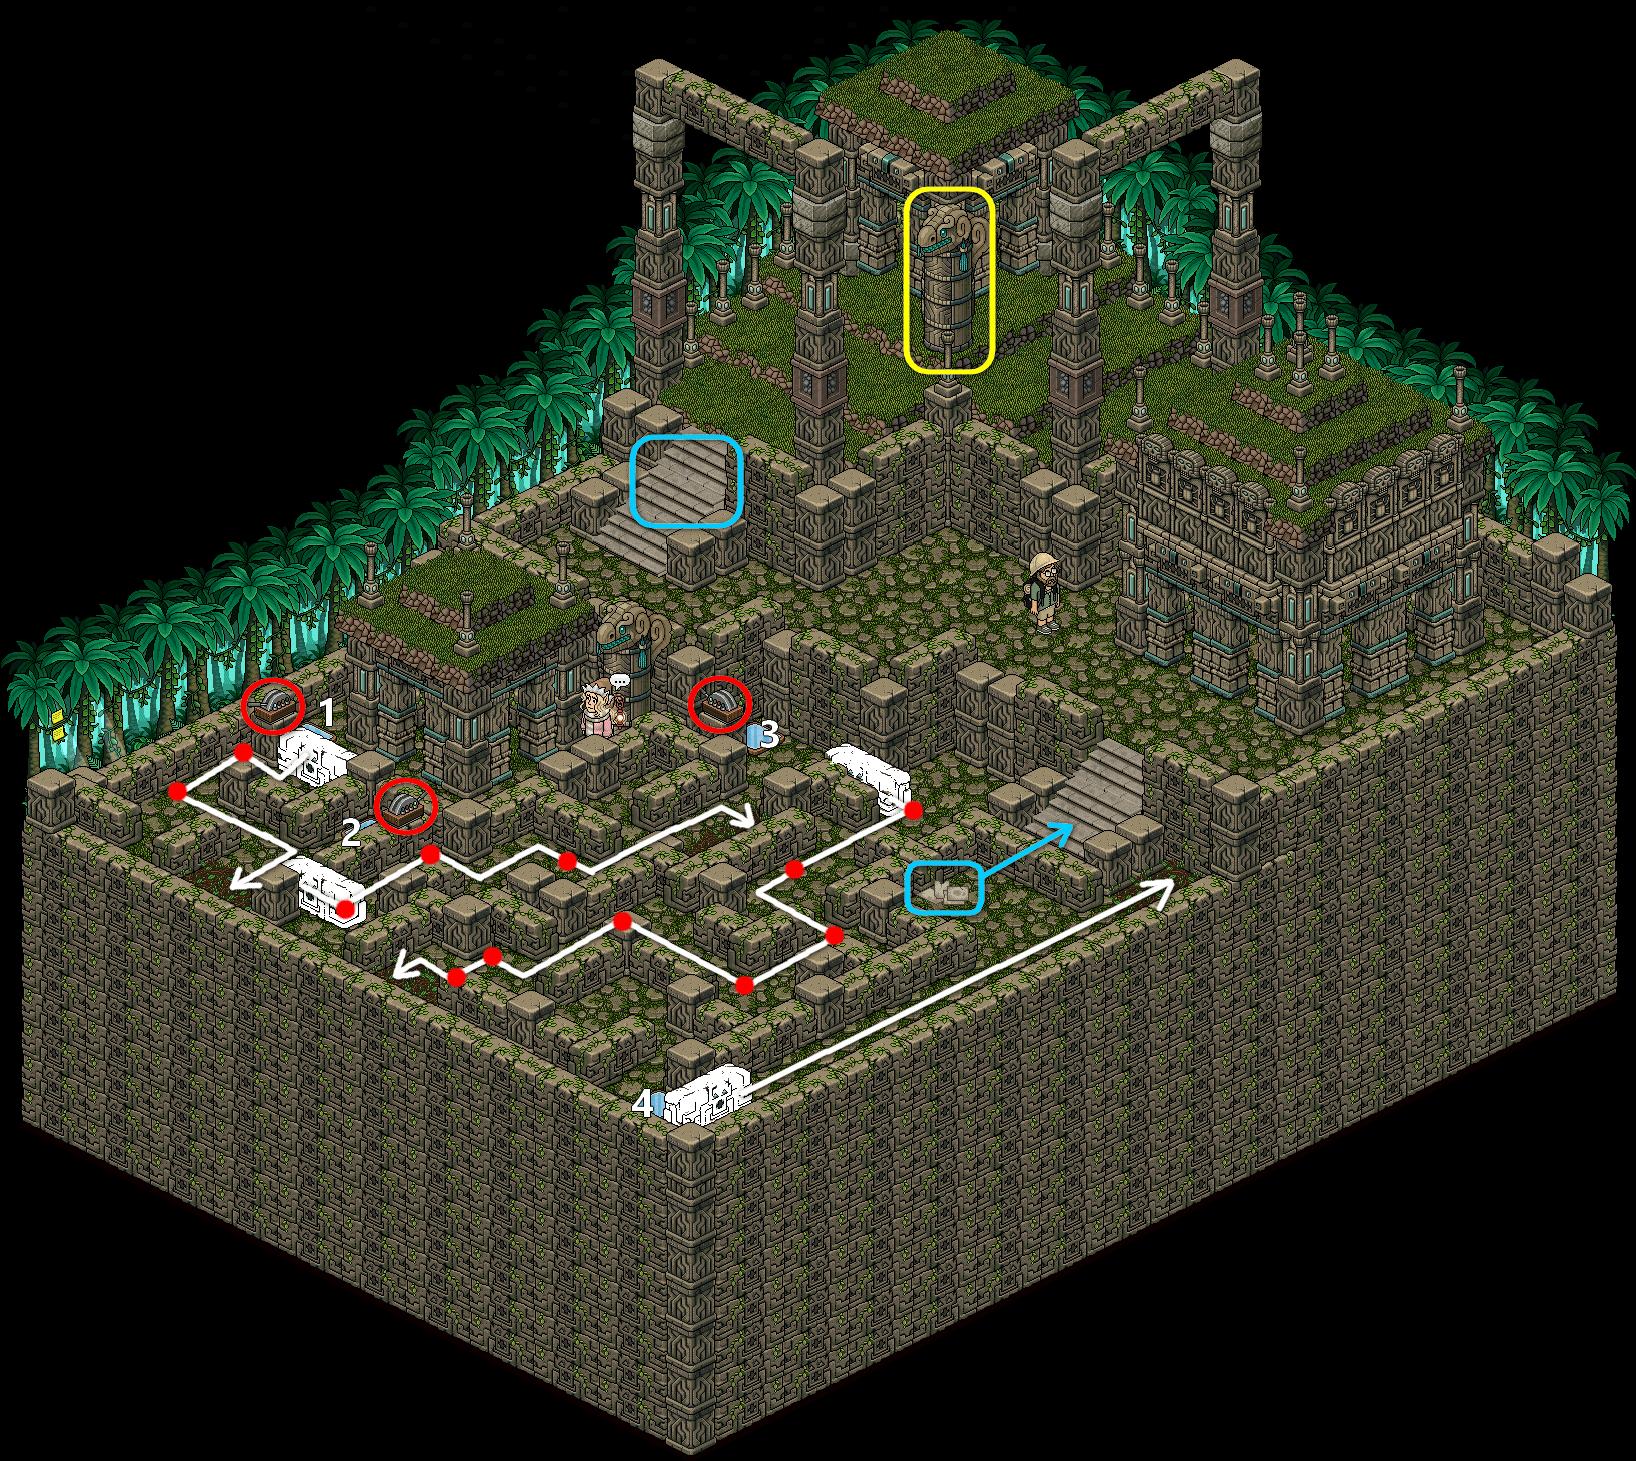 2. Ruines Tiki - A la recherche d'indices